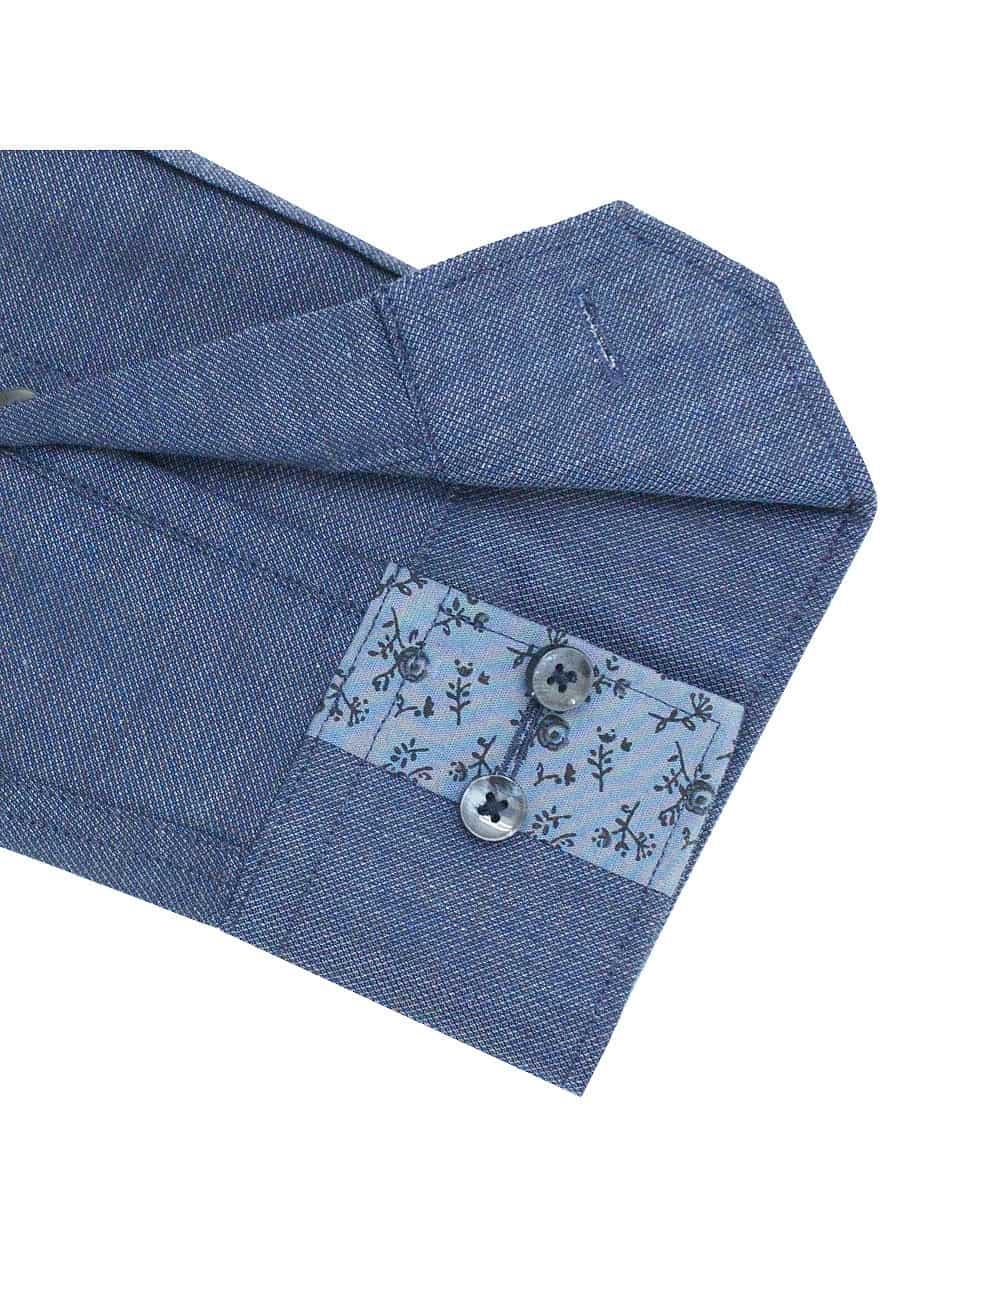 TF Blue Heather Easy Iron 100% Premium Cotton Long Sleeve Single Cuff Shirt TF2F5.15